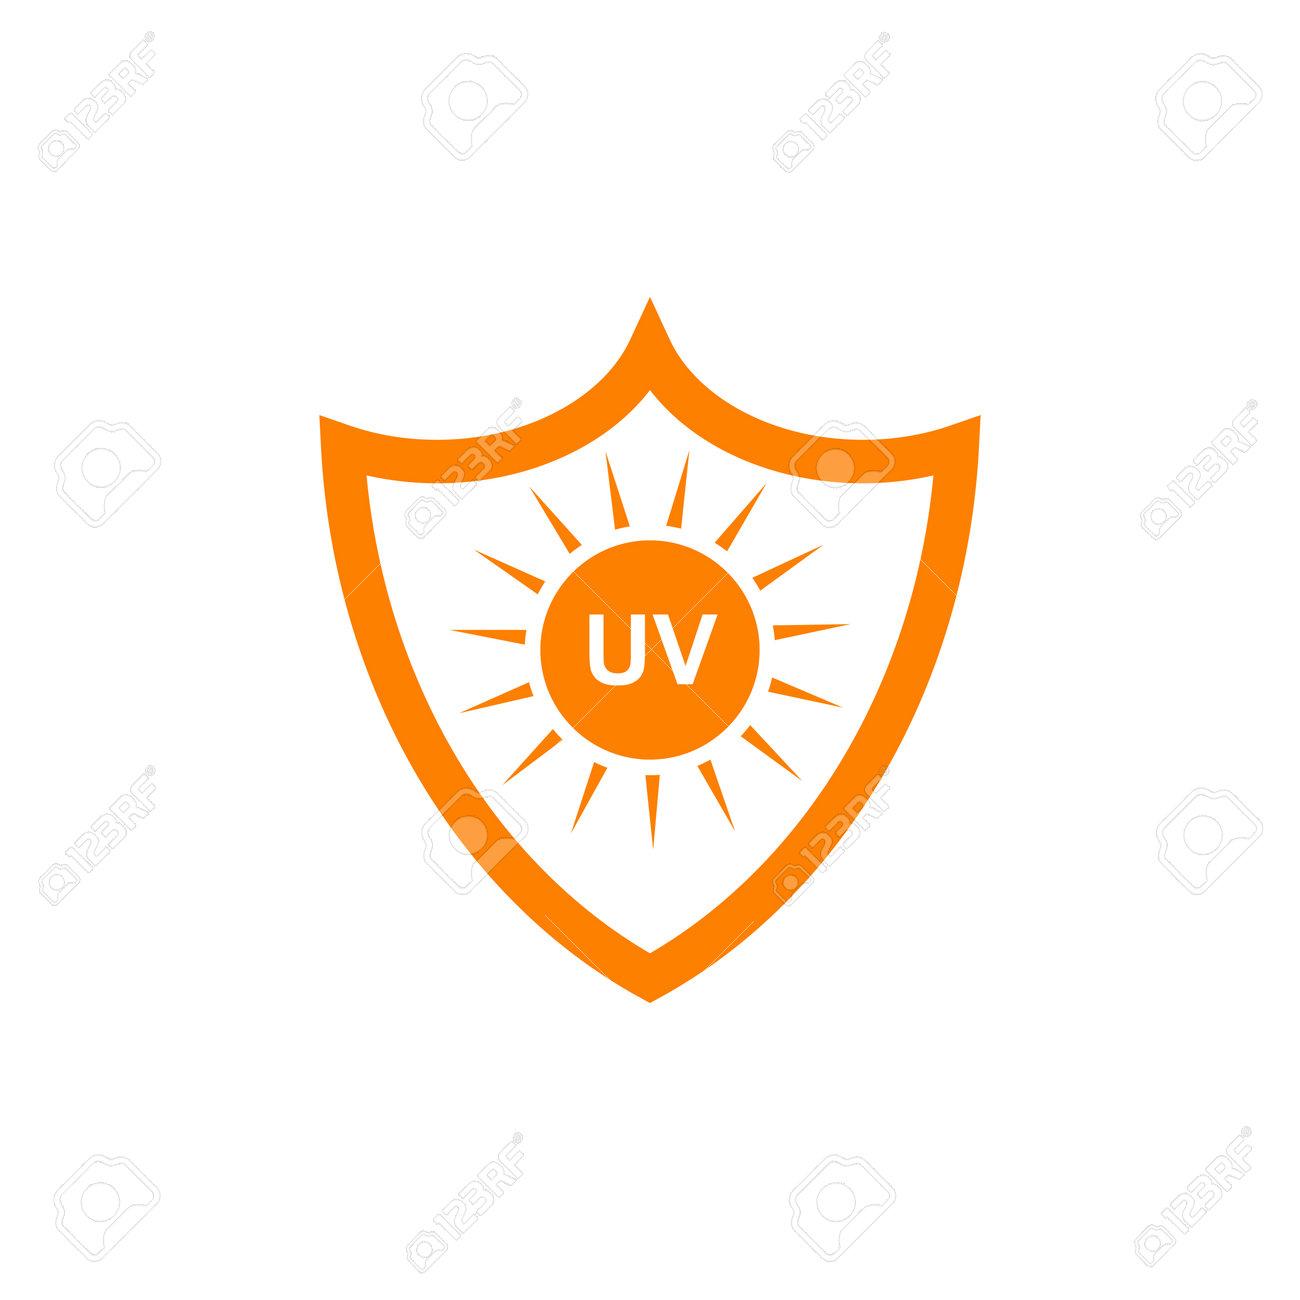 Ultra violet ray protection inspiration emblem logo design vector illustration template - 136971482